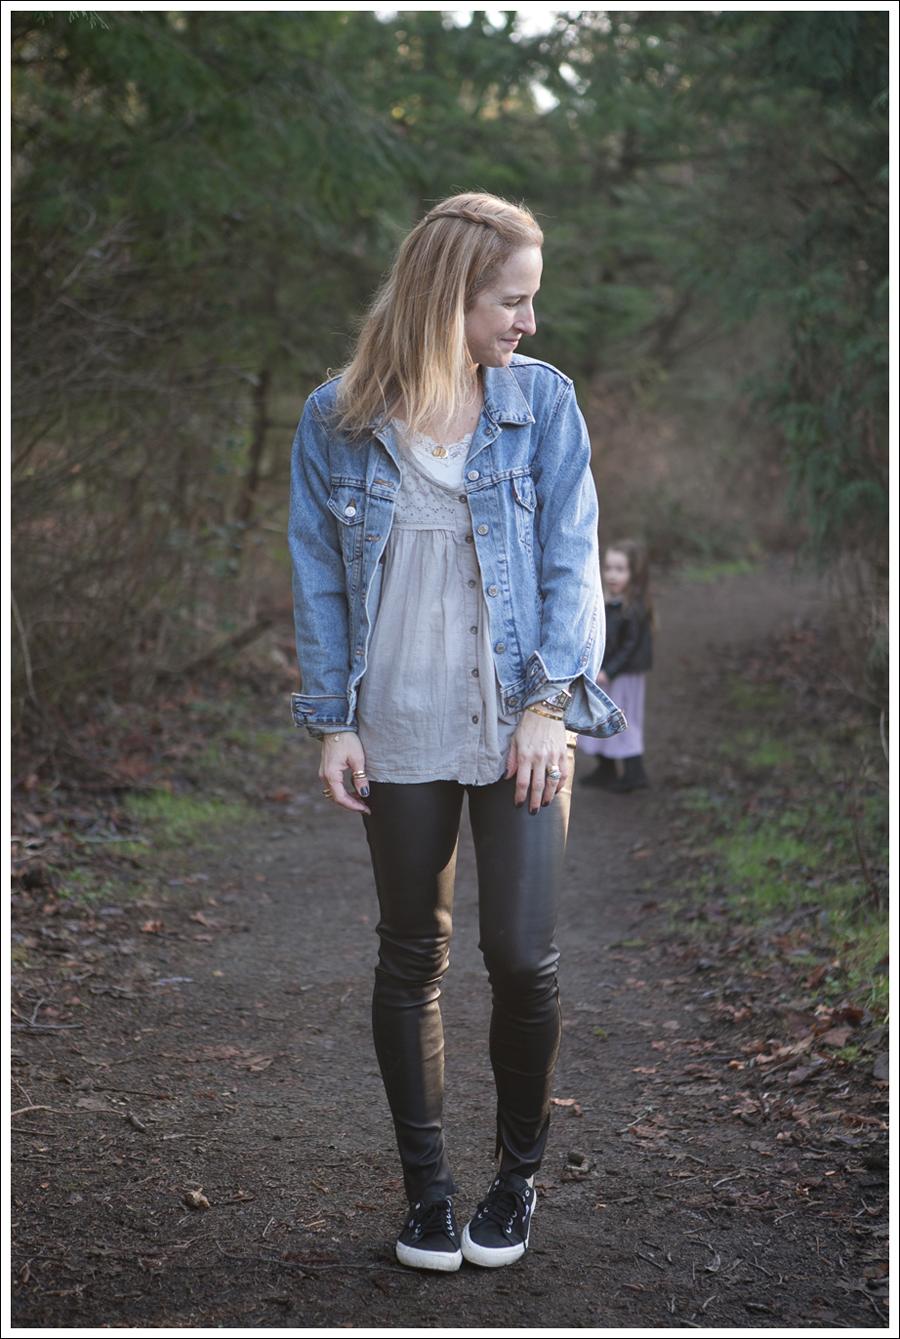 Blog Levis Jacket Free People two to tango Top Genetic Shya Leather Pants Superga-3